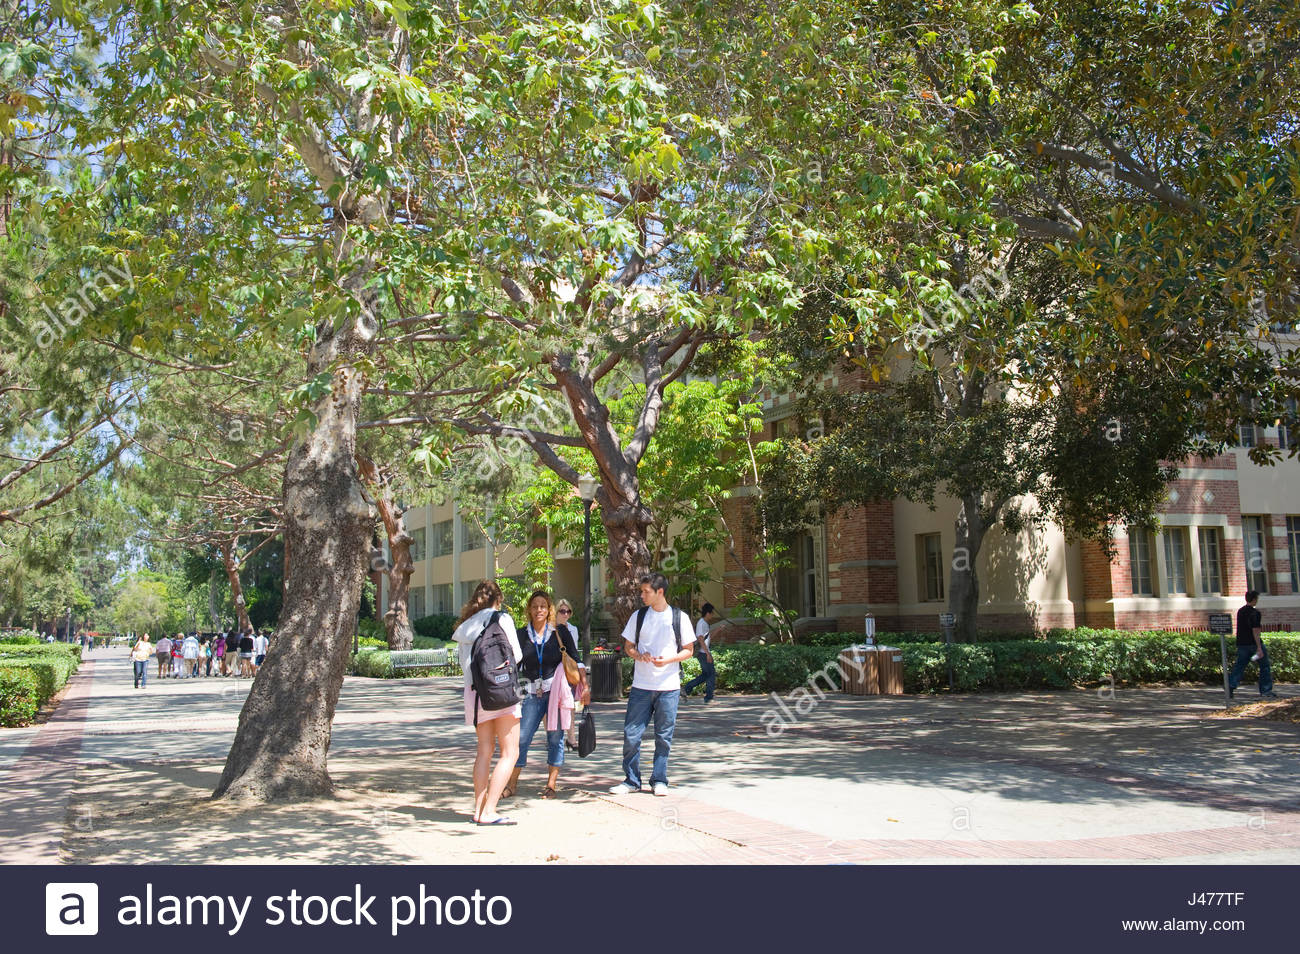 UCLA campus, Westwood, Los Angeles, California, USA - Stock Image